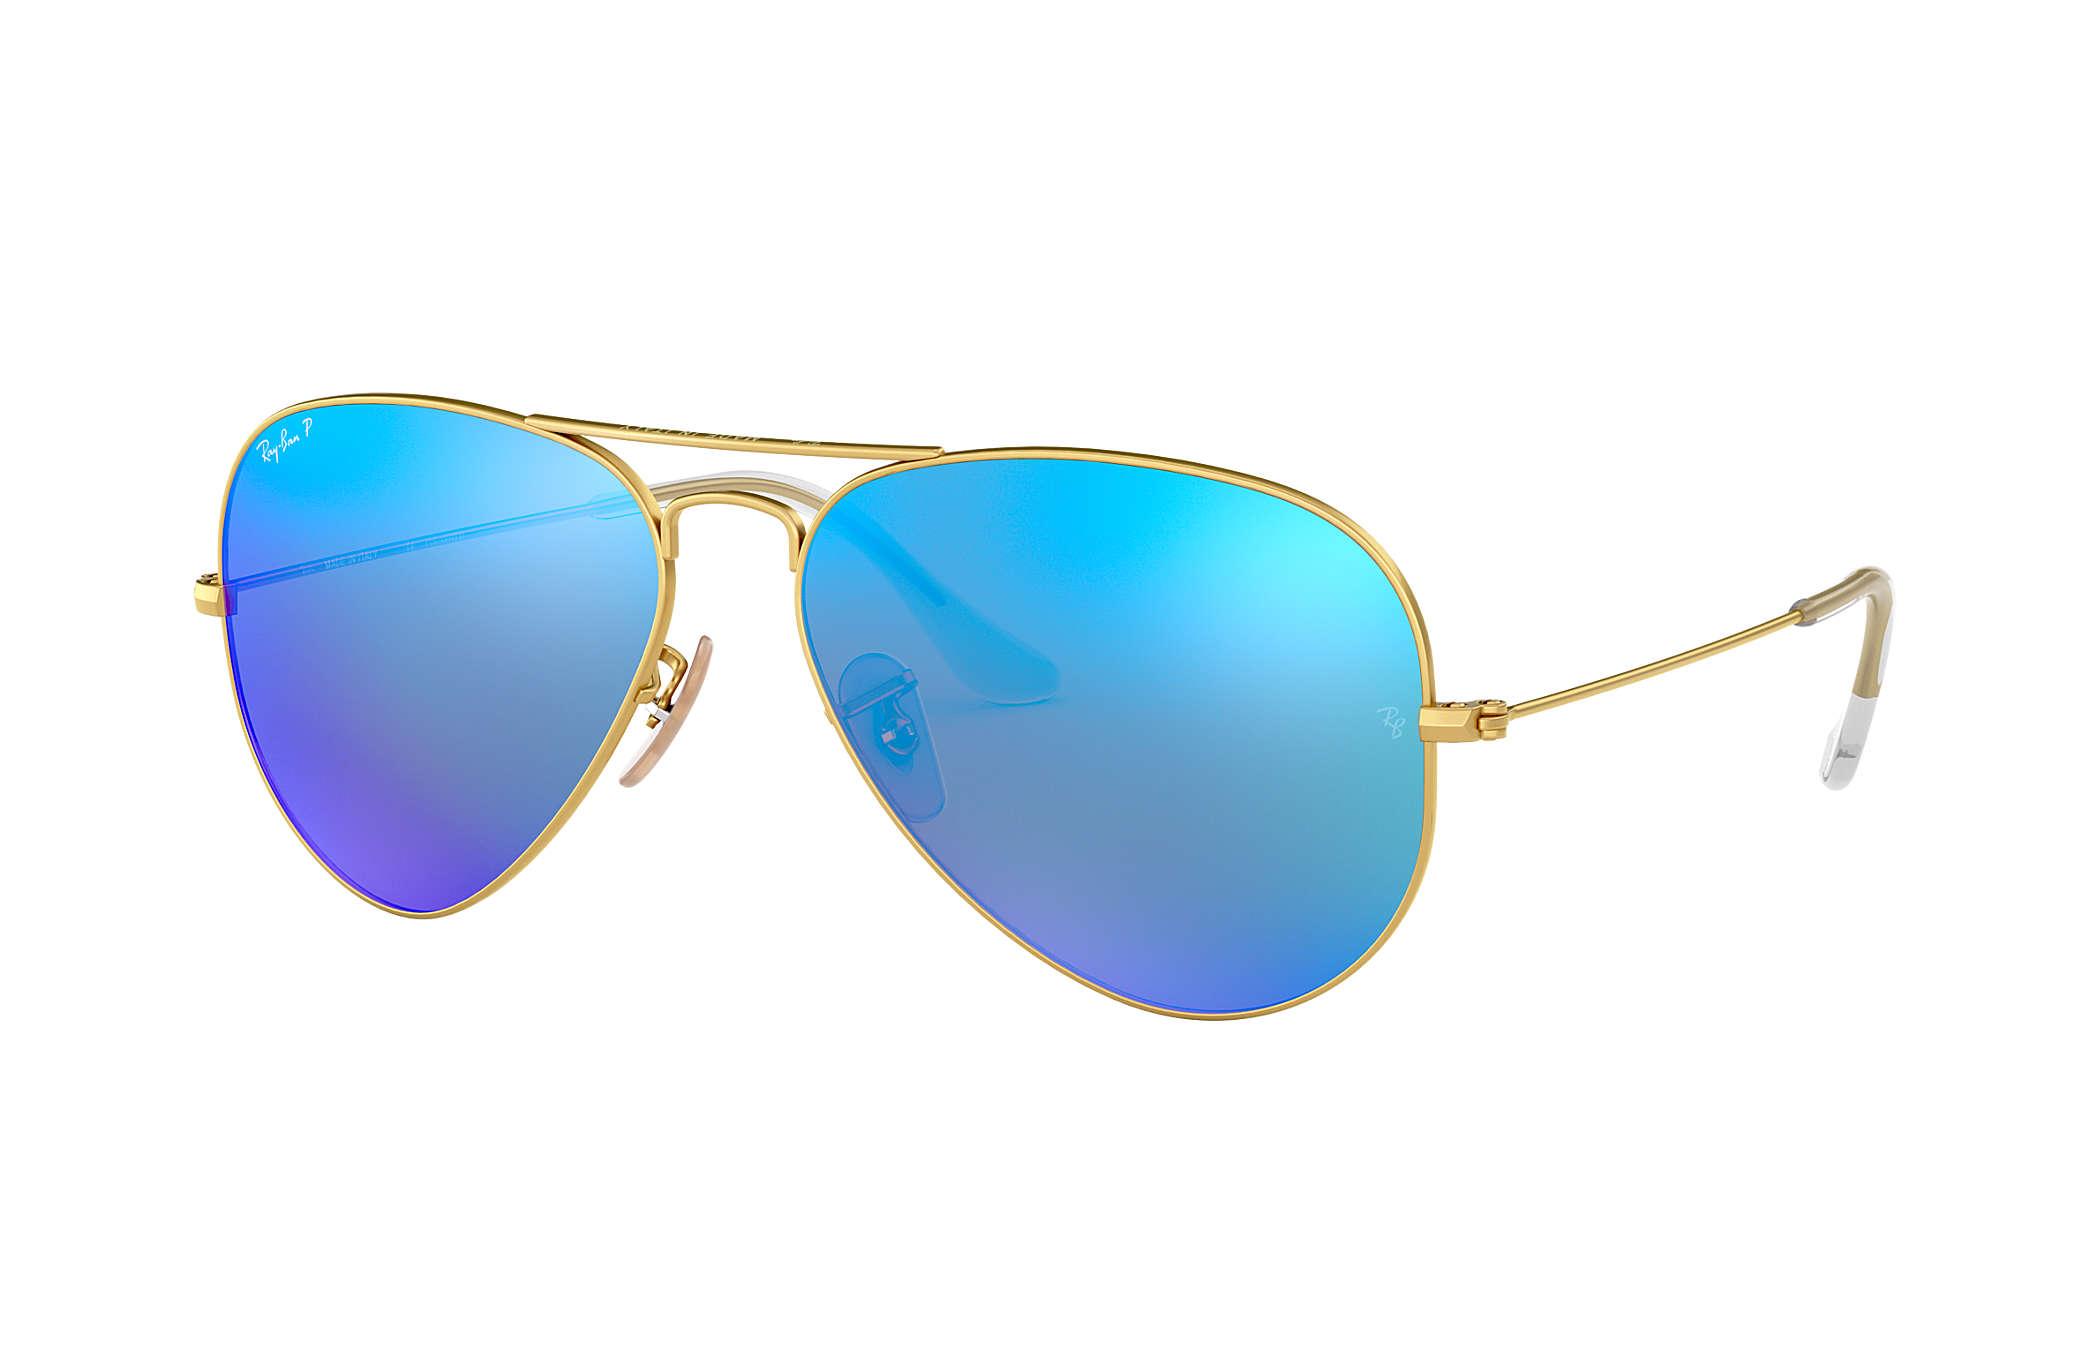 Ray-Ban Aviator Espelhado RB3025 Ouro - Metal - Lentes polarizadas ... 2cd50d67b7